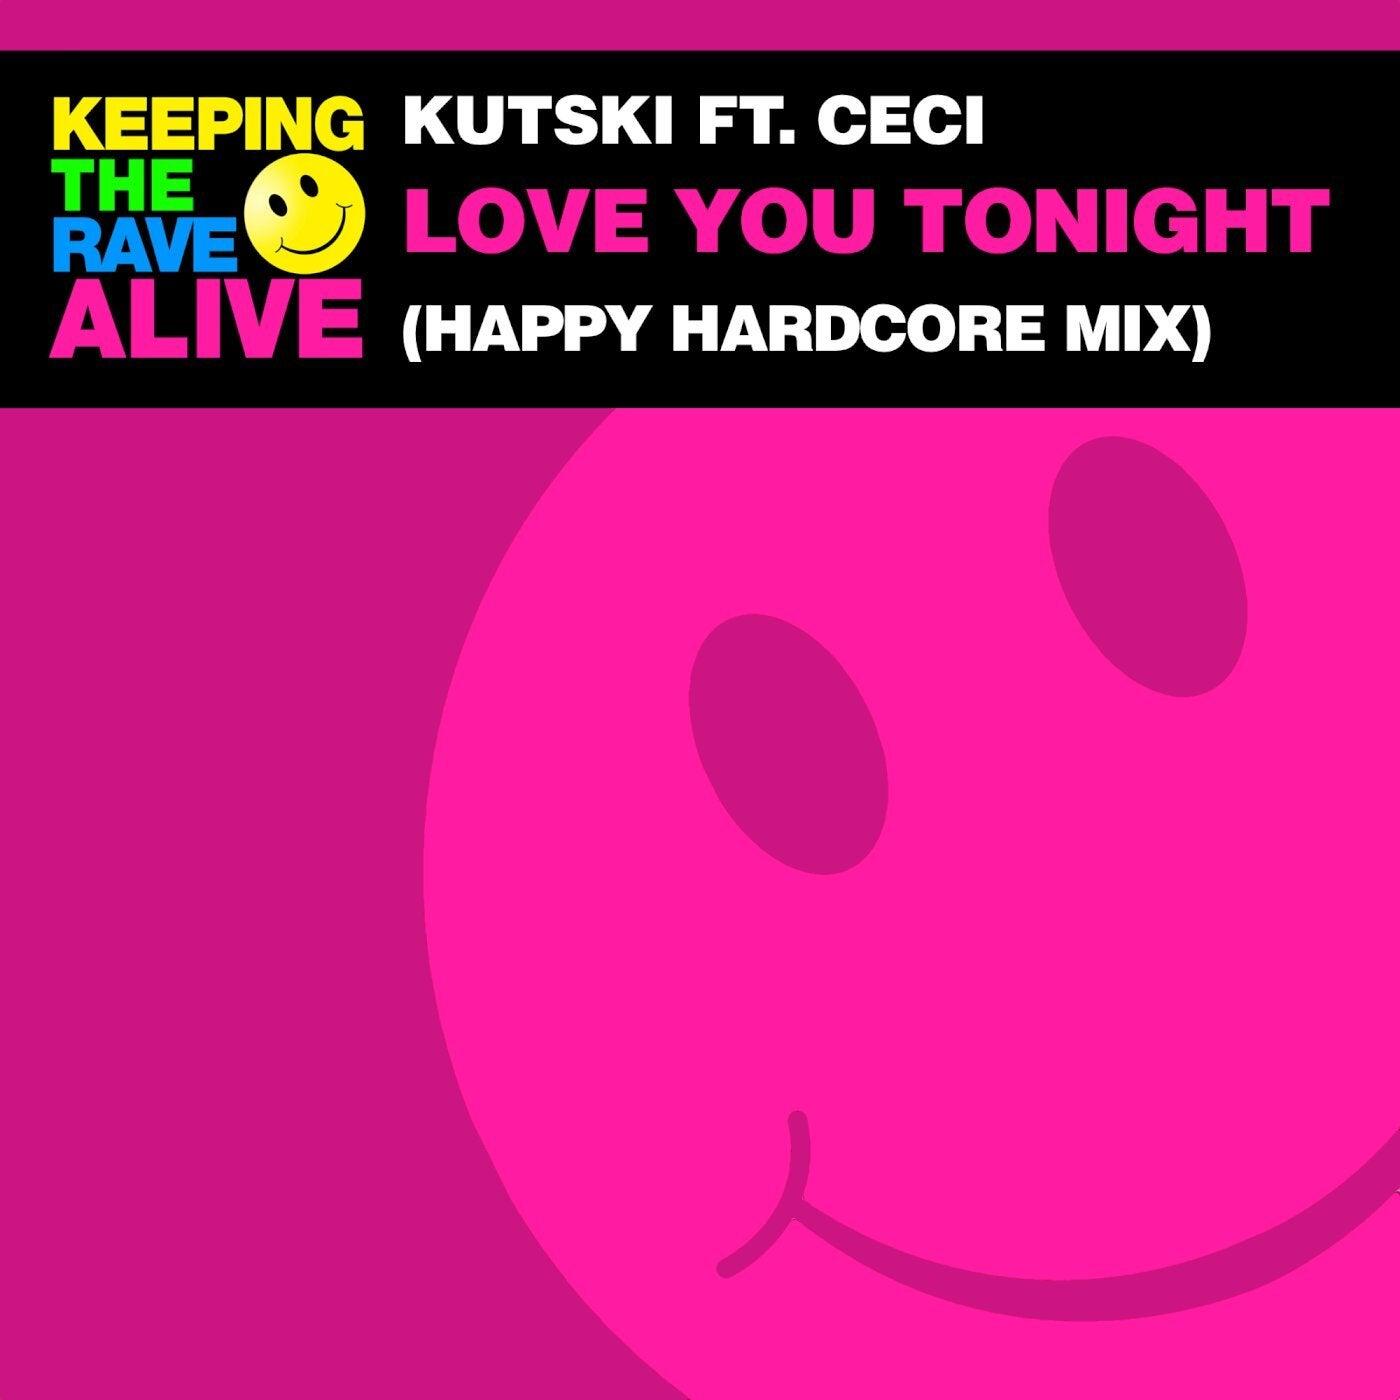 Love You Tonight (Happy Hardcore Mix)